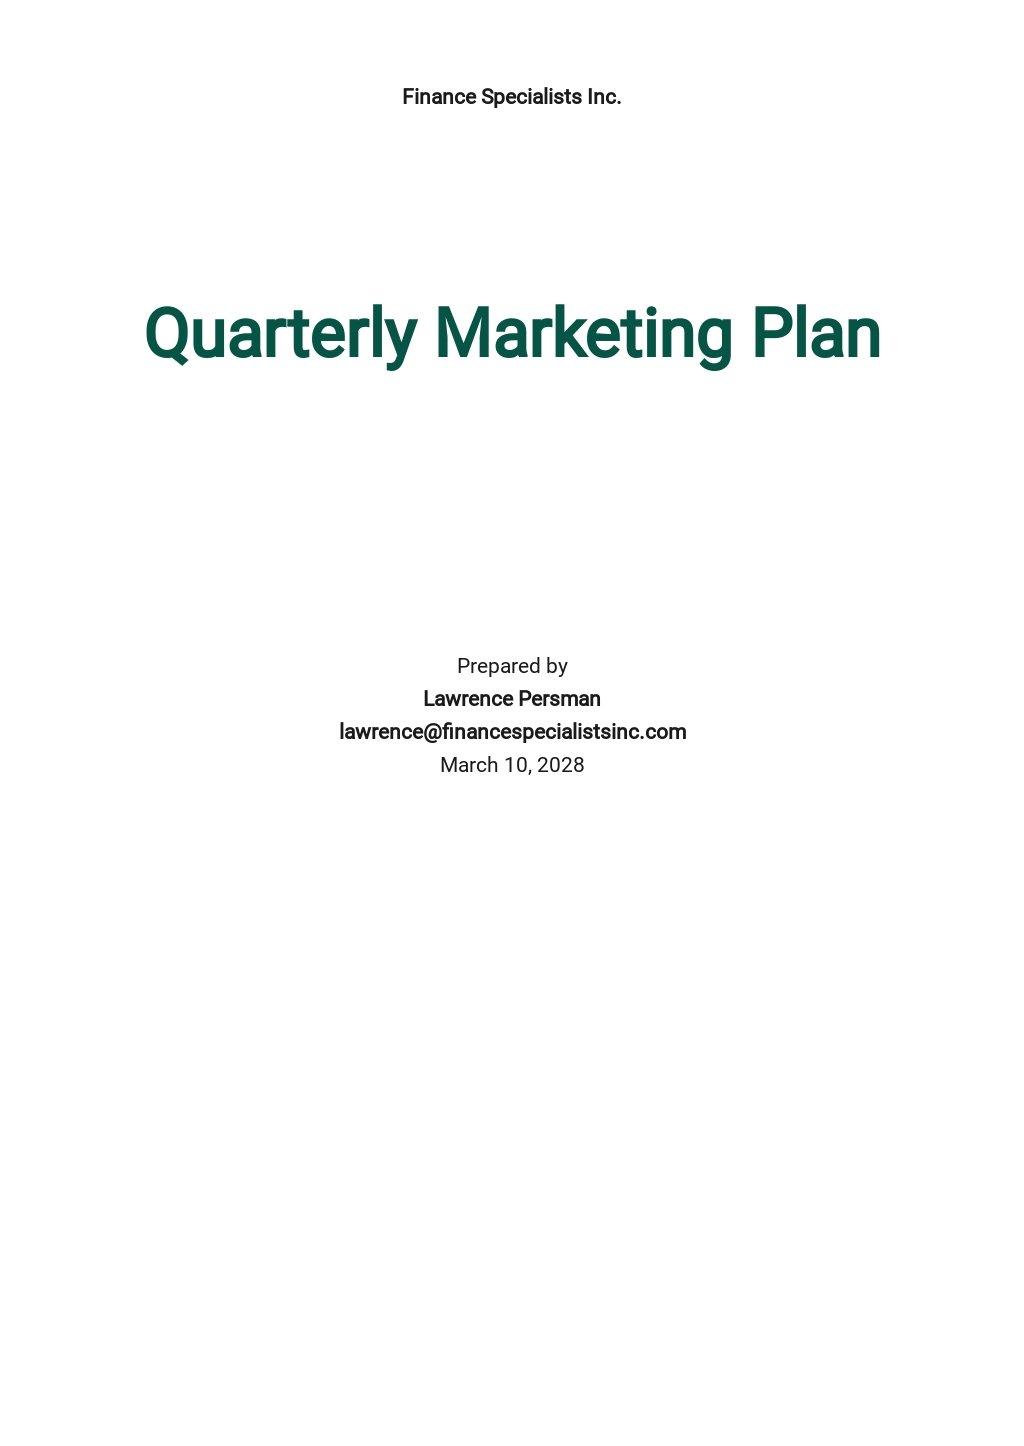 Quarterly Marketing Plan Template